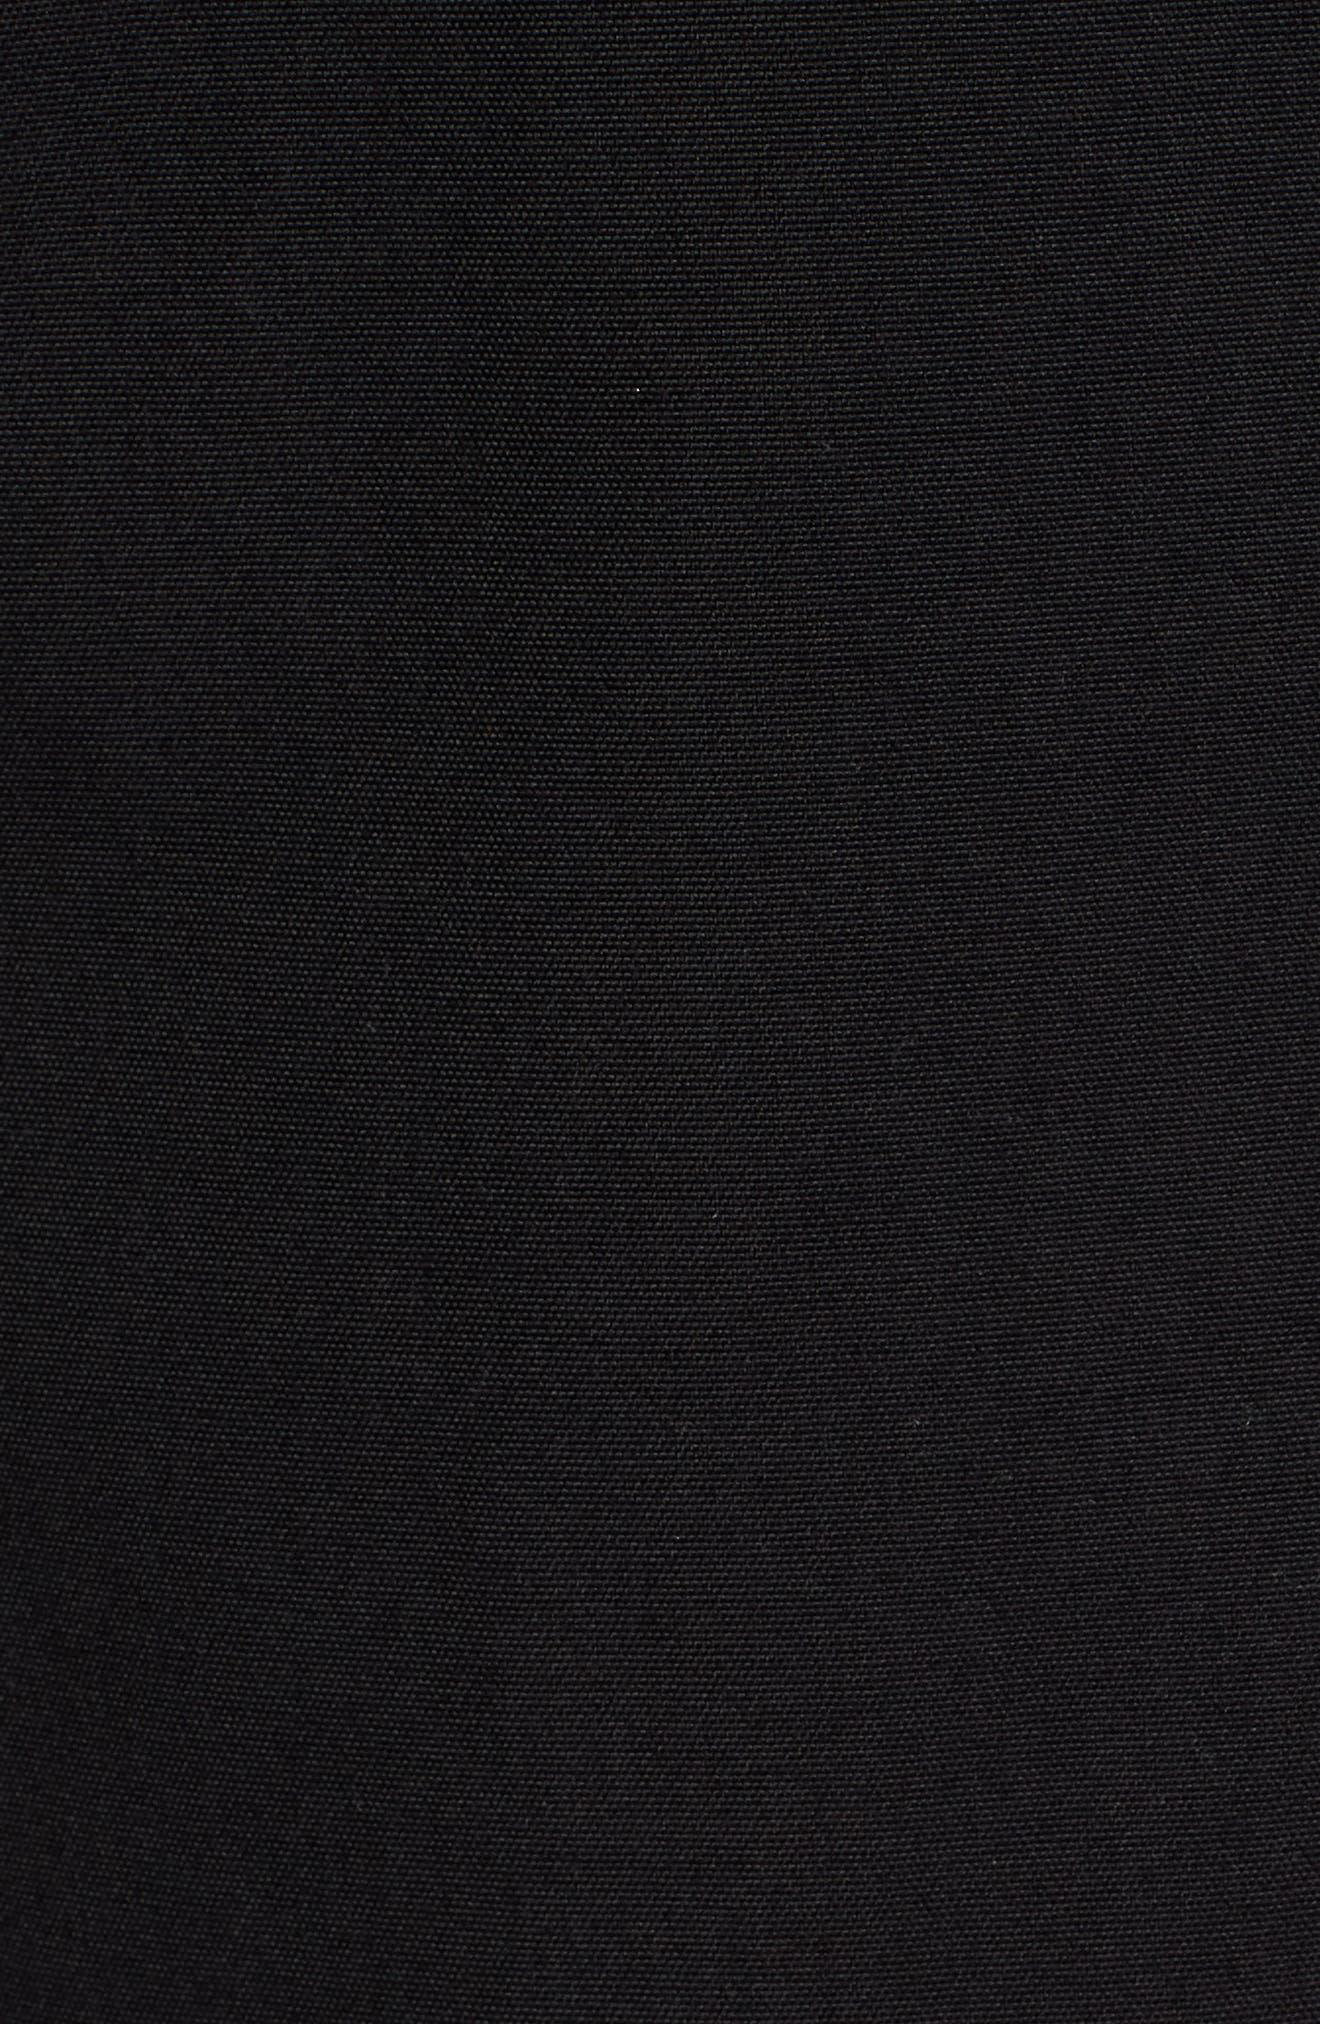 Urban Windproof & Waterproof Primaloft<sup>®</sup> Long Jacket,                             Alternate thumbnail 6, color,                             BLACK